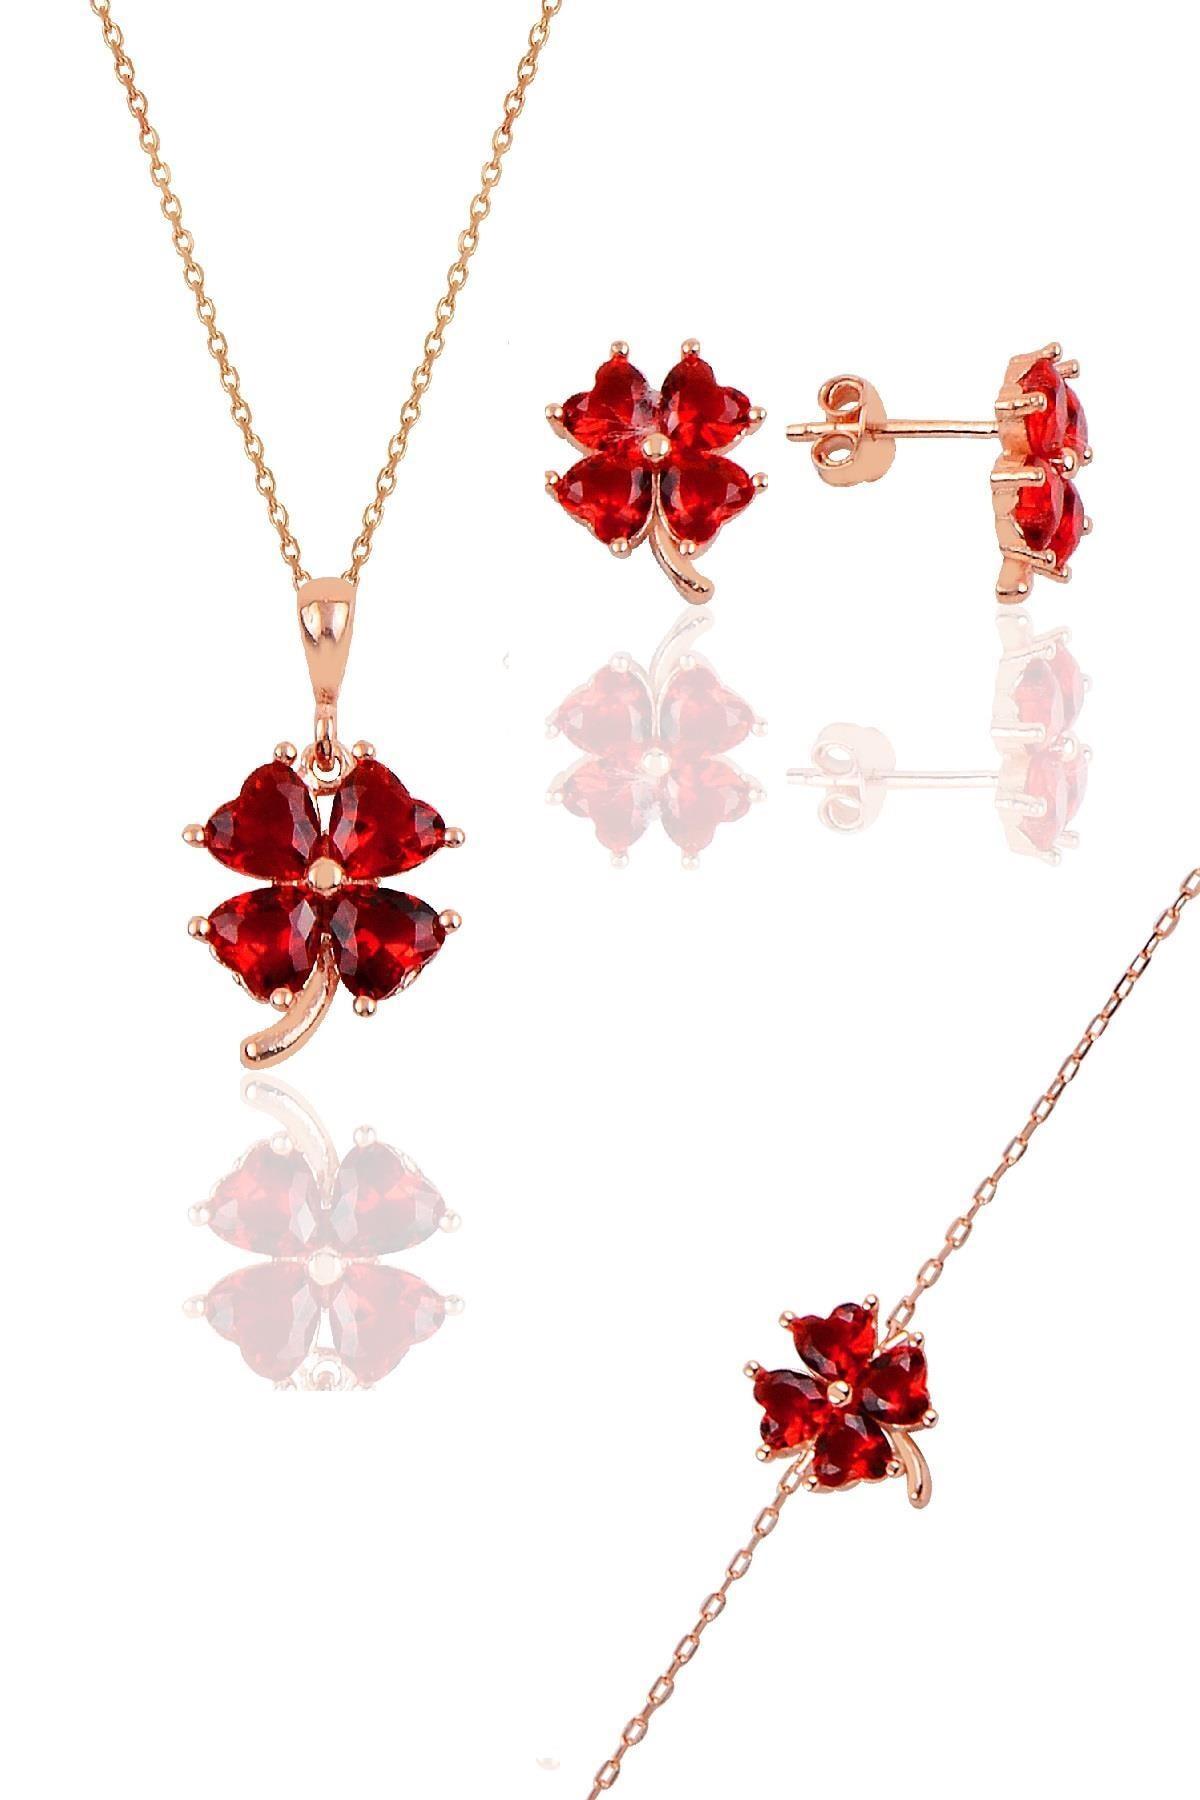 Söğütlü Silver Gümüş rose lal  renkli yonca modeli üçlü set